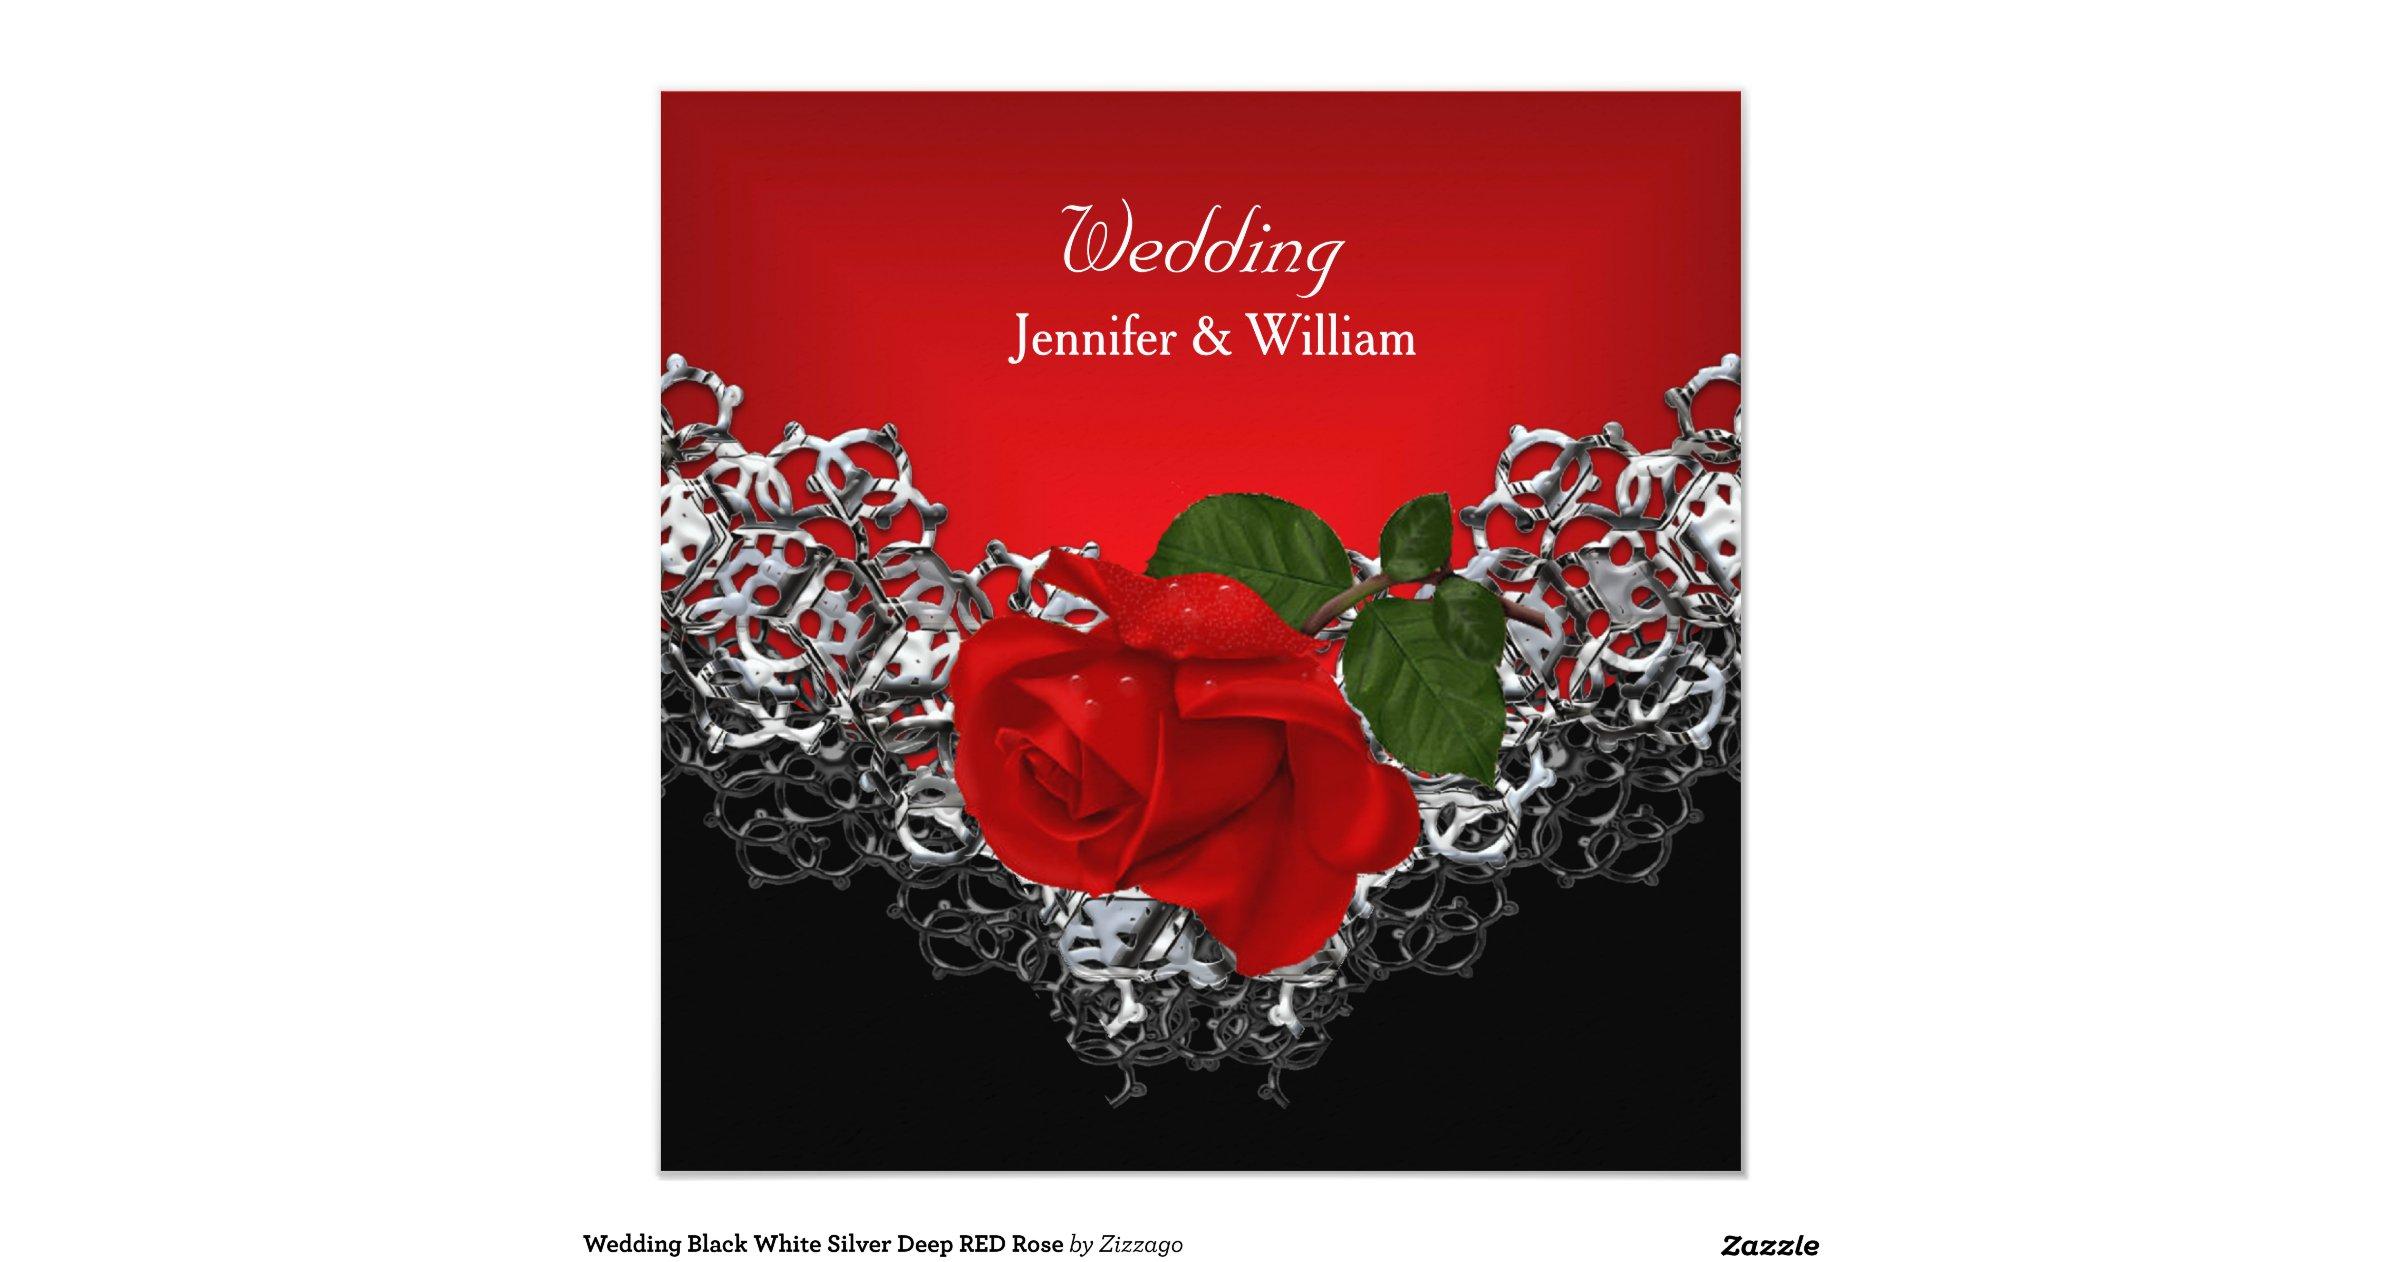 Black Red Silver White Rose Wedding Invitations